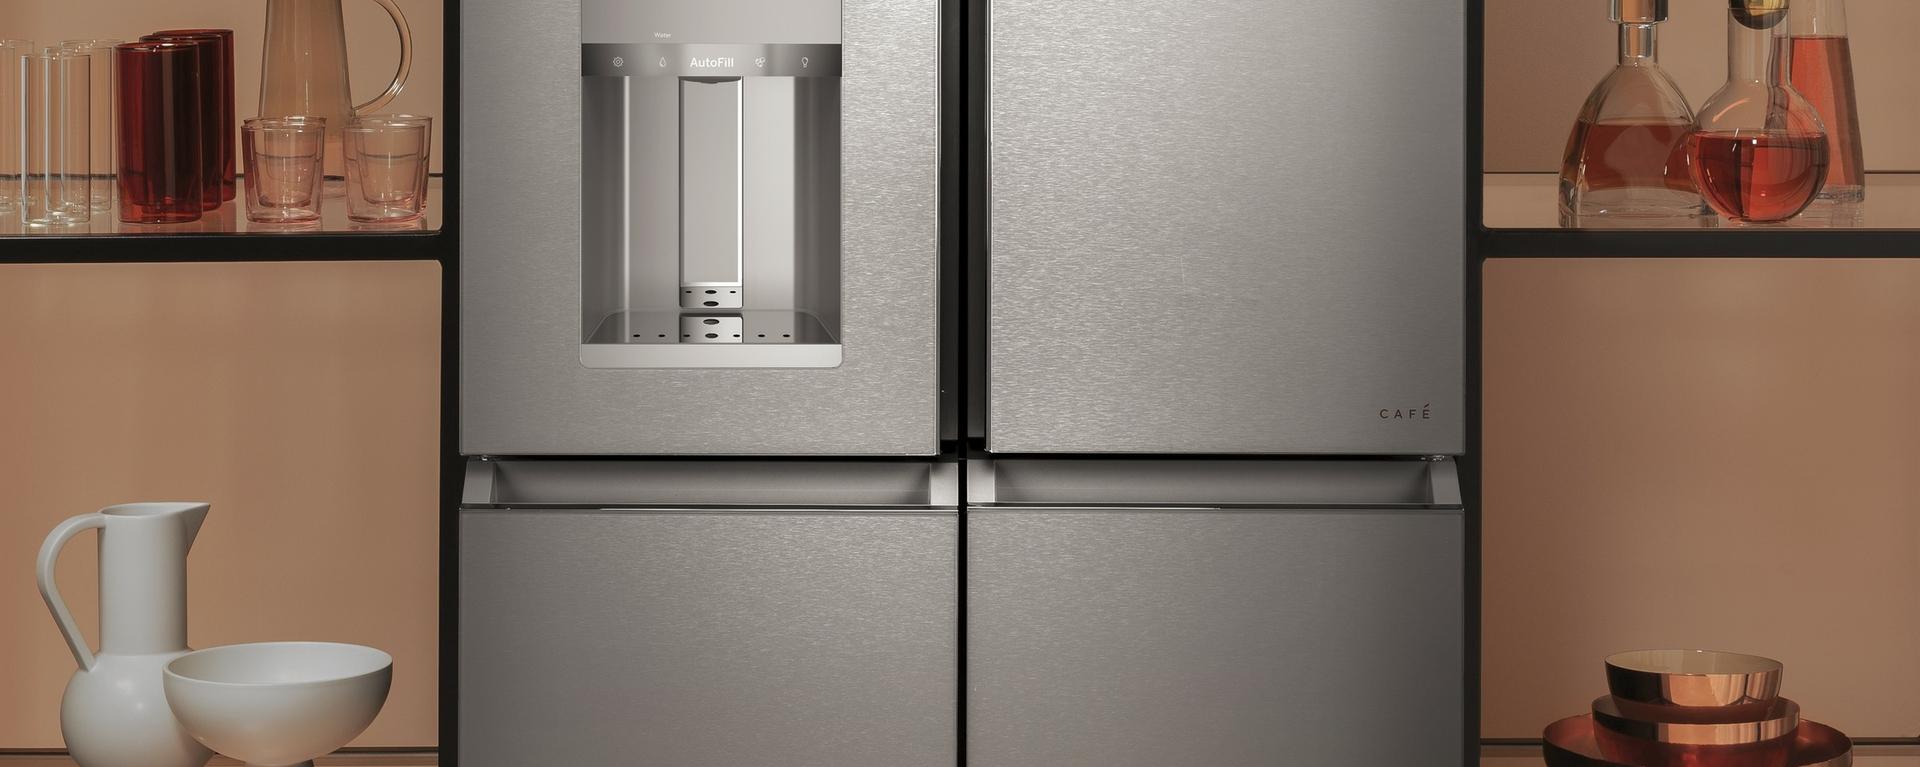 CAFE Quad-Door Refrigerator in Modern Glass